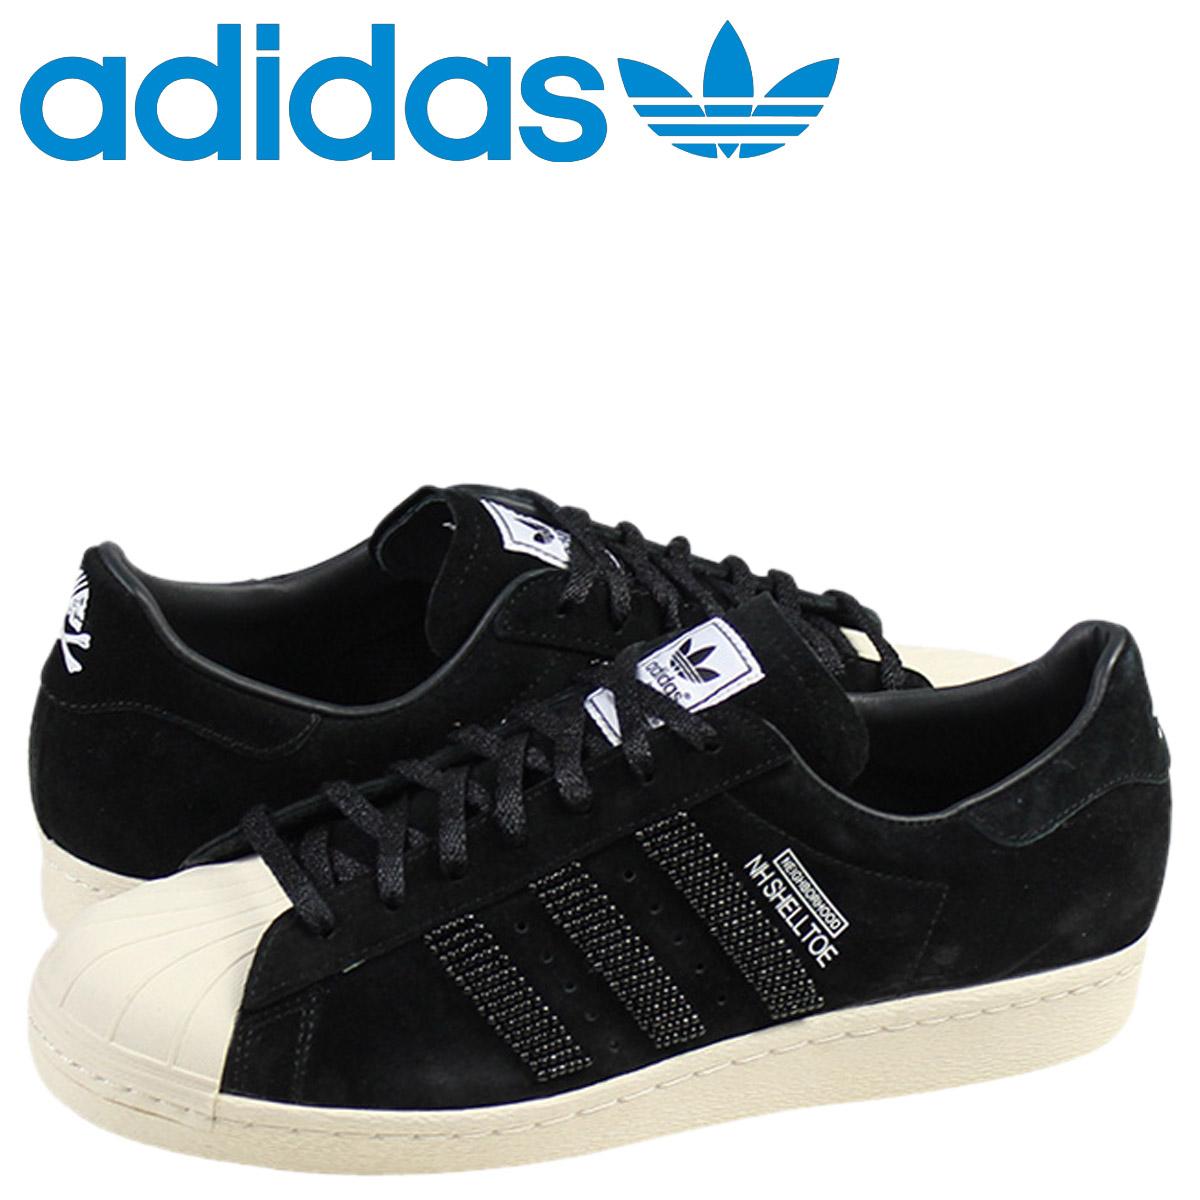 xedzv SneaK Online Shop | Rakuten Global Market: Adidas originals adidas